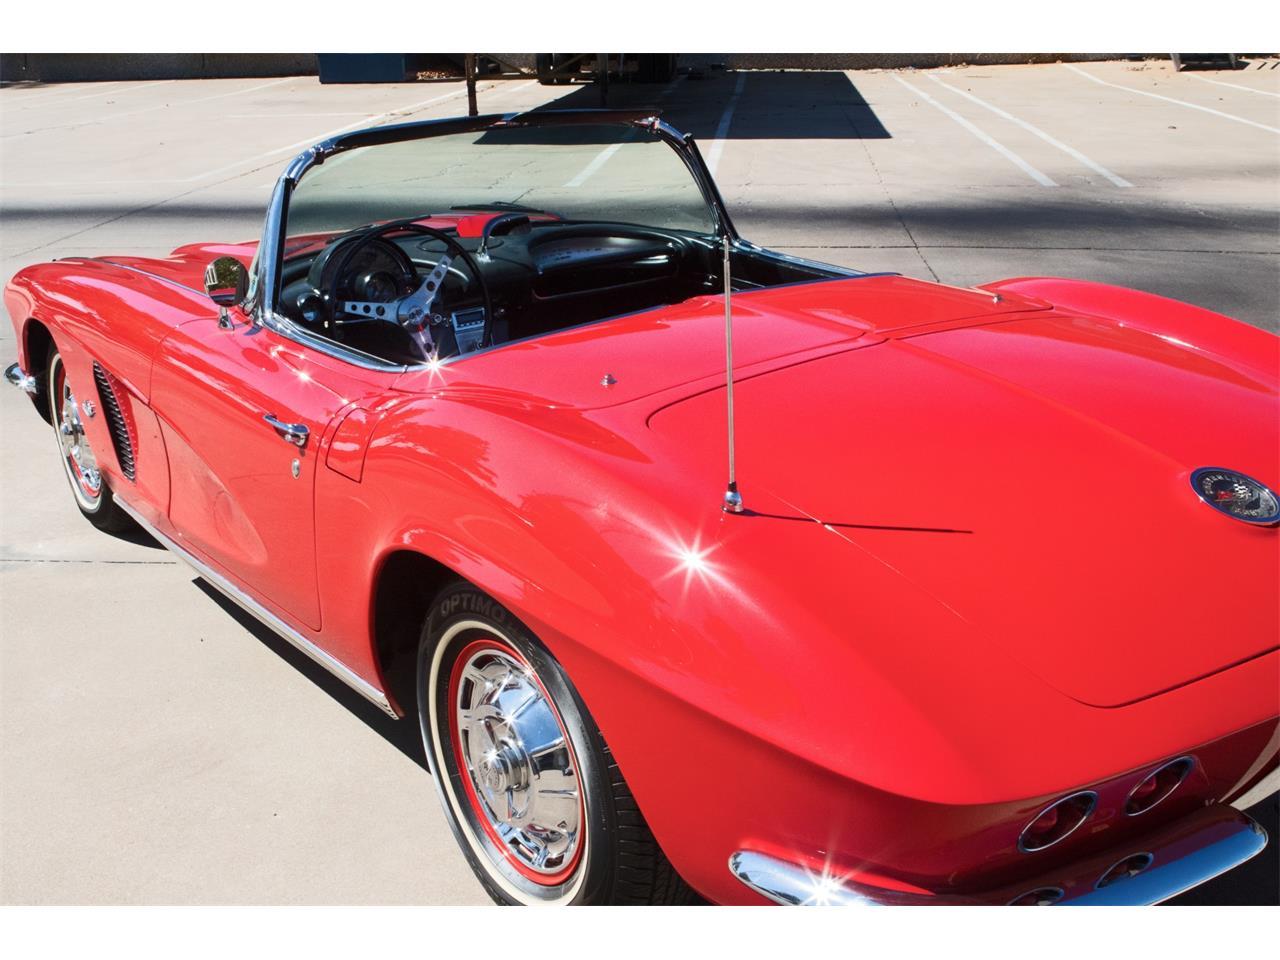 1962 Chevrolet Corvette (CC-1328740) for sale in Garland, Texas